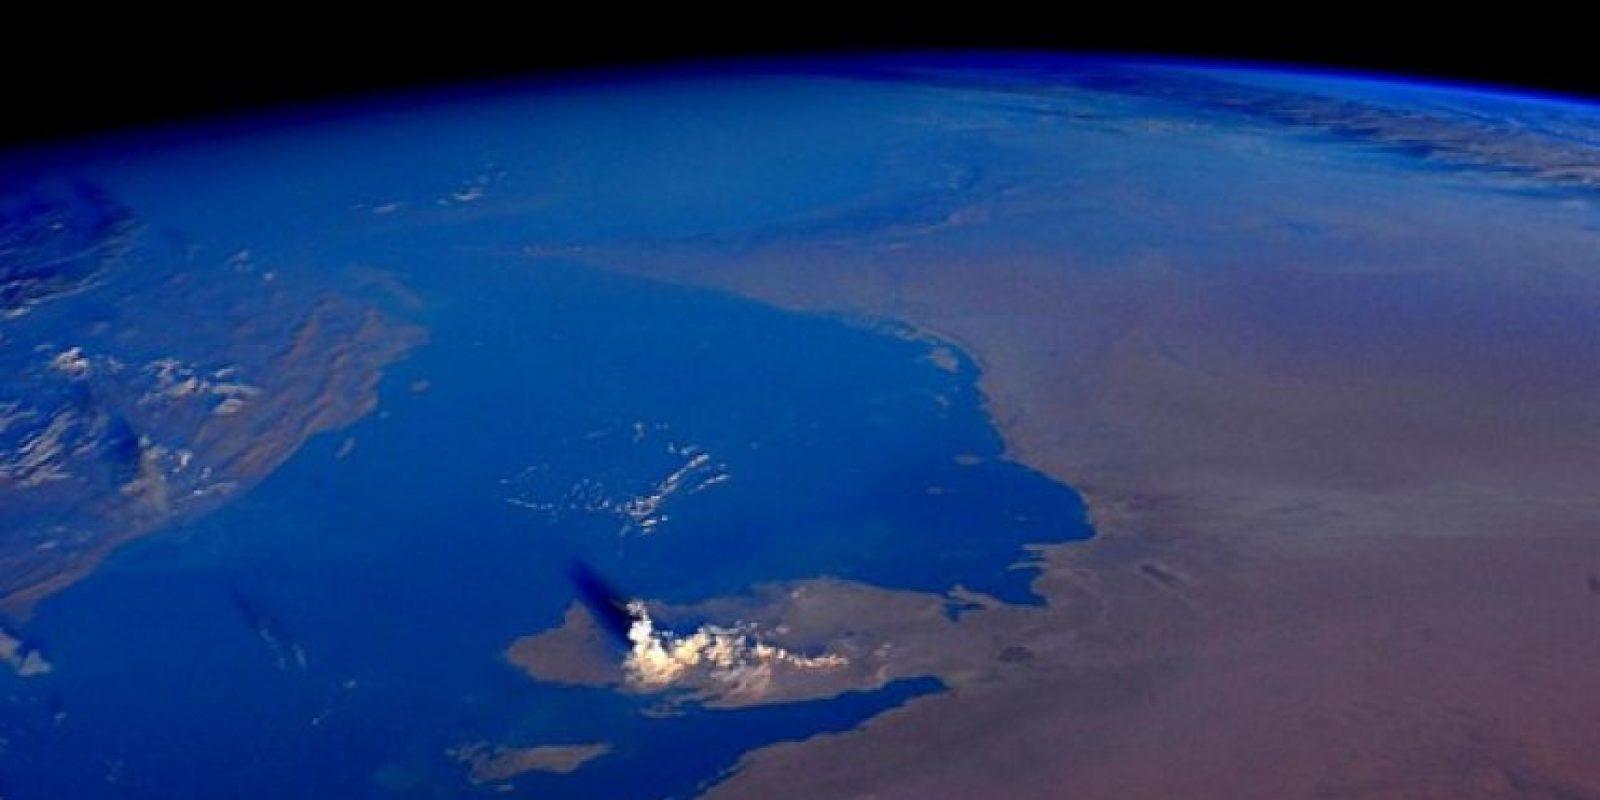 Qatar Foto:Vía instagram.com/stationcdrkelly